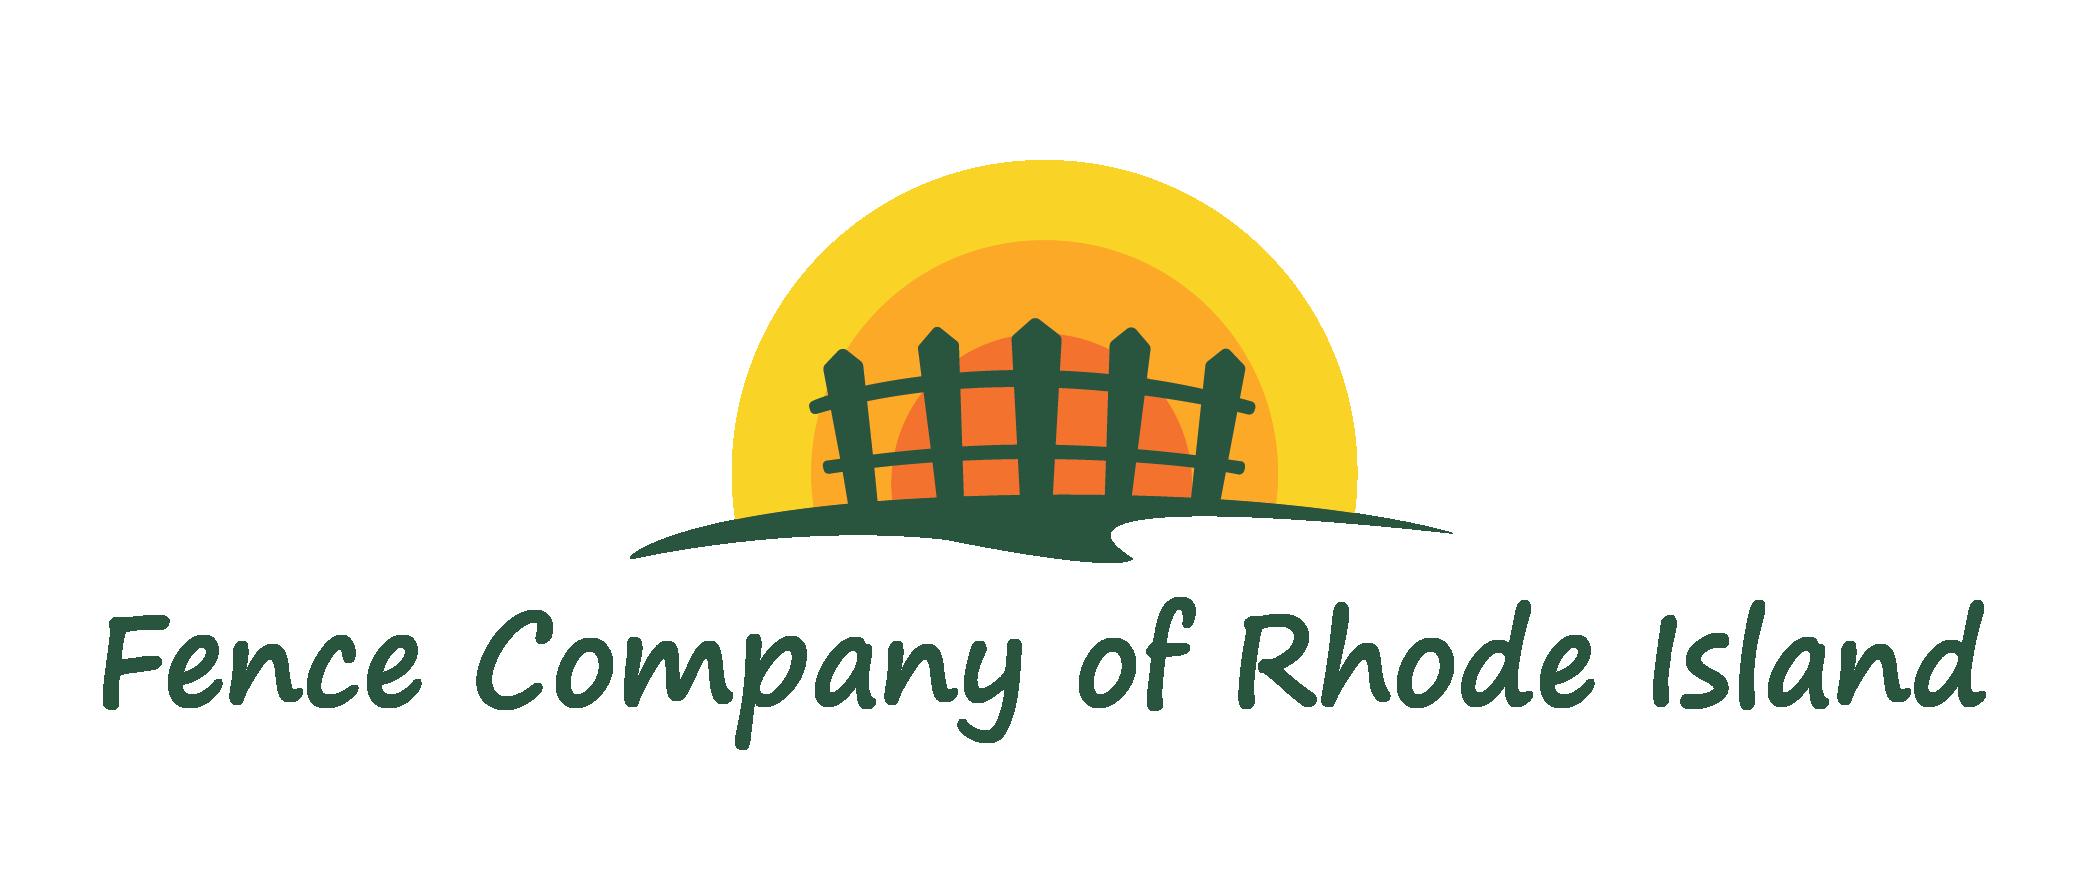 Fence Company of Rhode Island